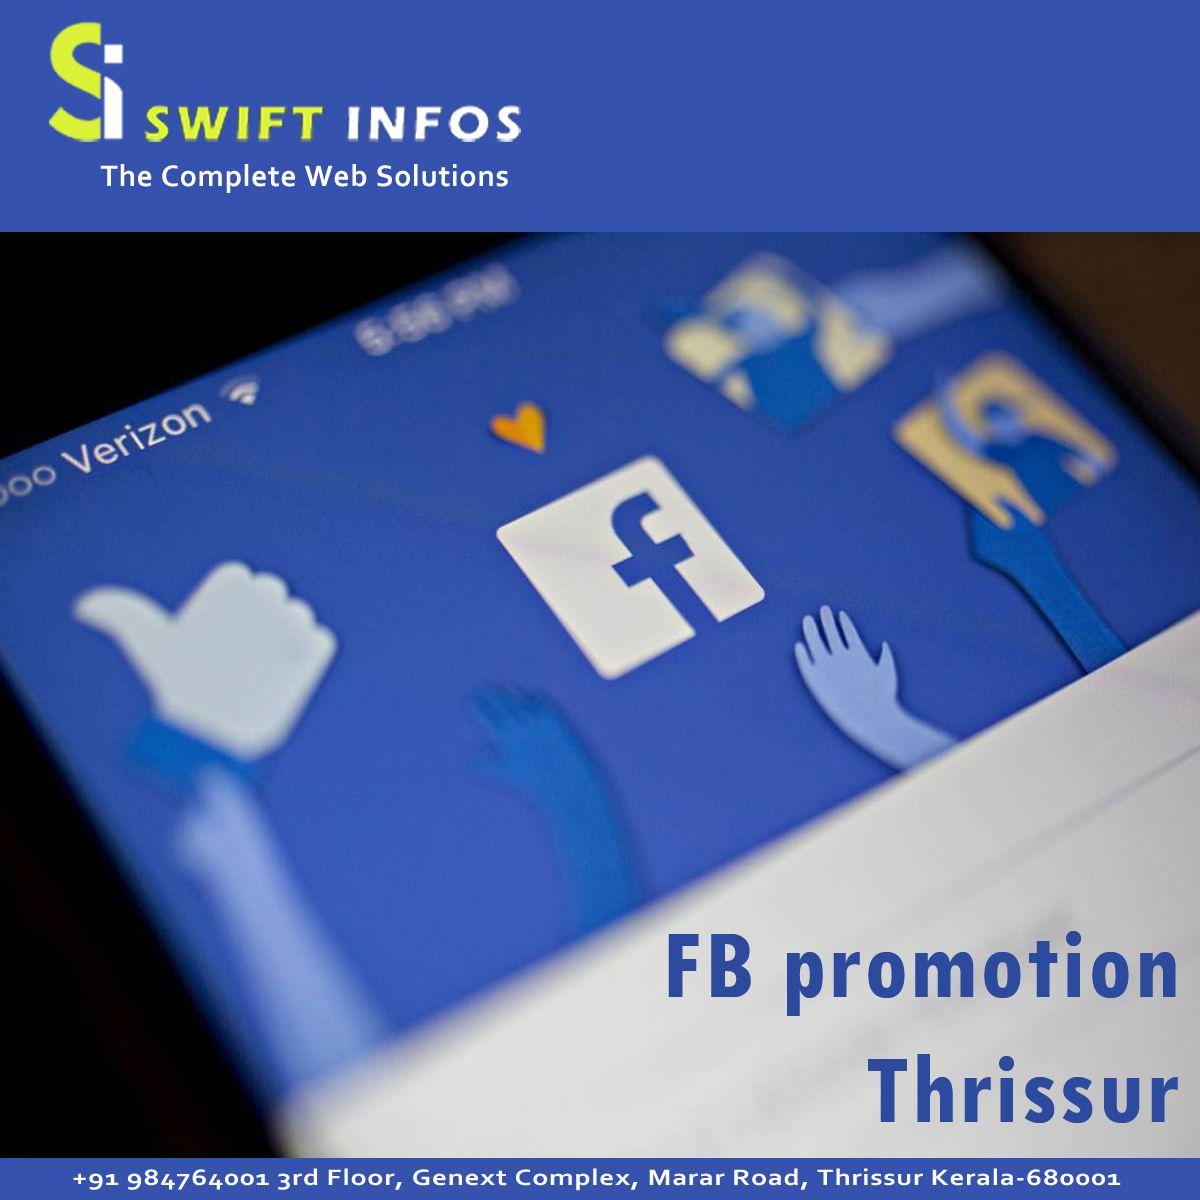 Do You Use Facebook For Business Helping Your Business By Promoting Your Facebookbusinesspage Swi Facebook Business Social Media Optimization Web Design